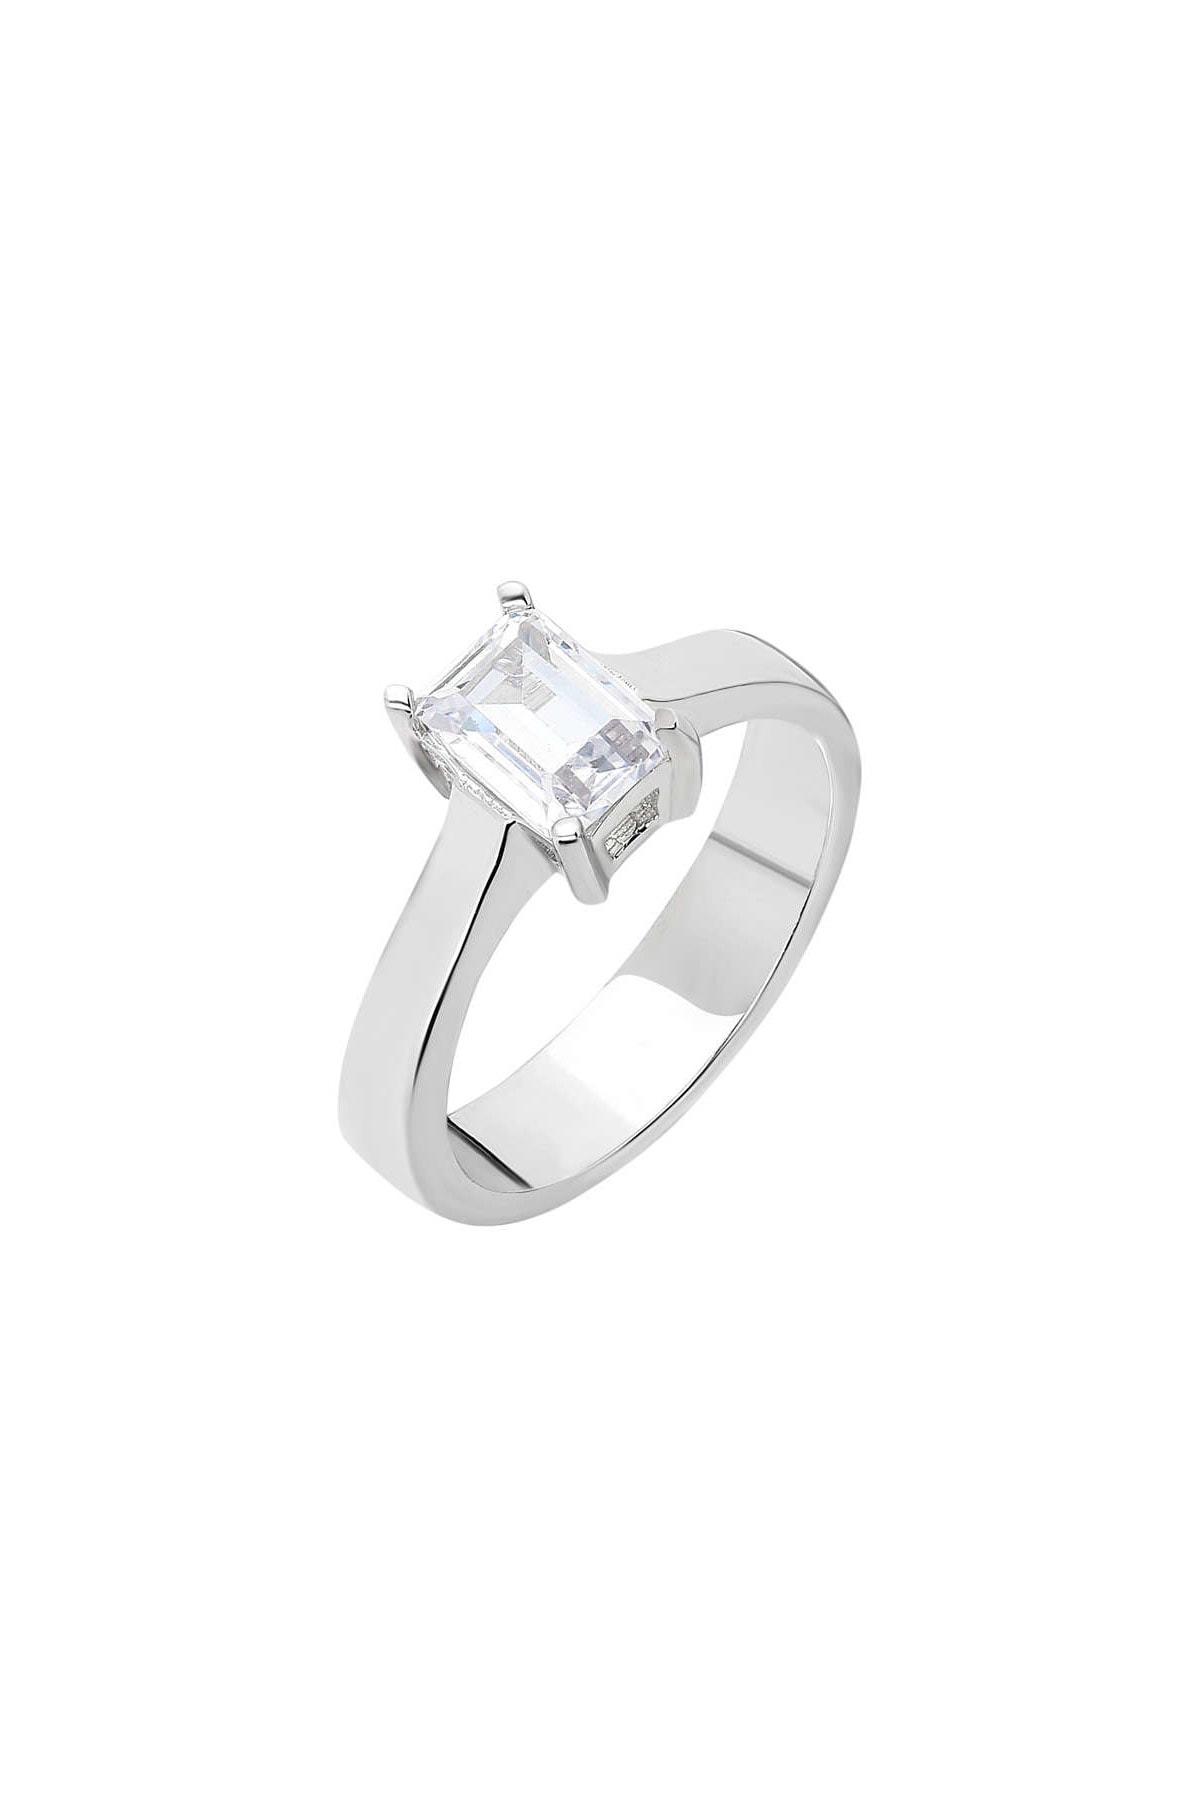 Tesbihane Starlight Diamond Pırlanta Montür Minimal Tasarım 925 Ayar Gümüş Bayan Baget Yüzük 102001792 3